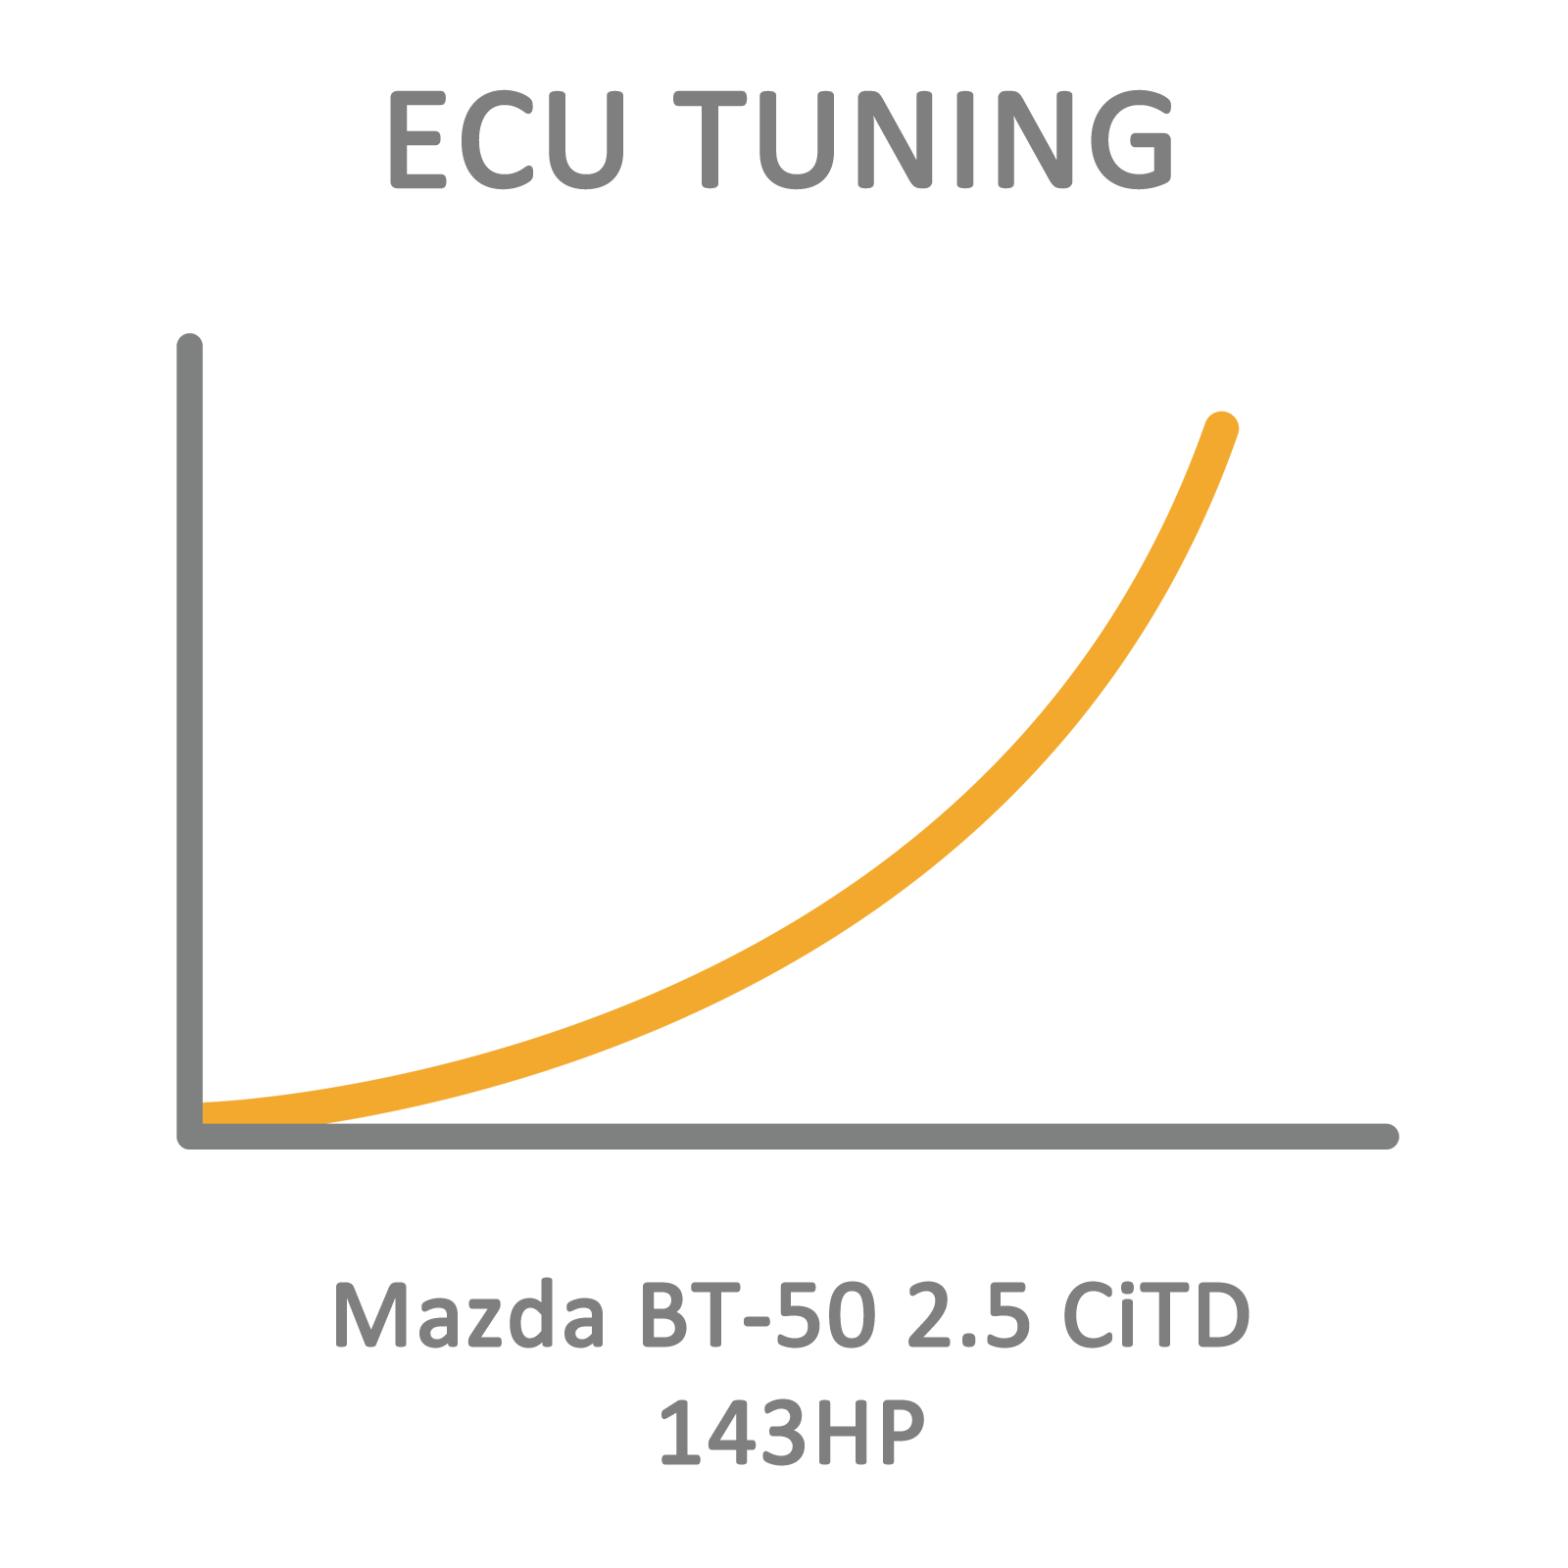 Mazda BT-50 2.5 CiTD 143HP ECU Tuning Remapping Programming